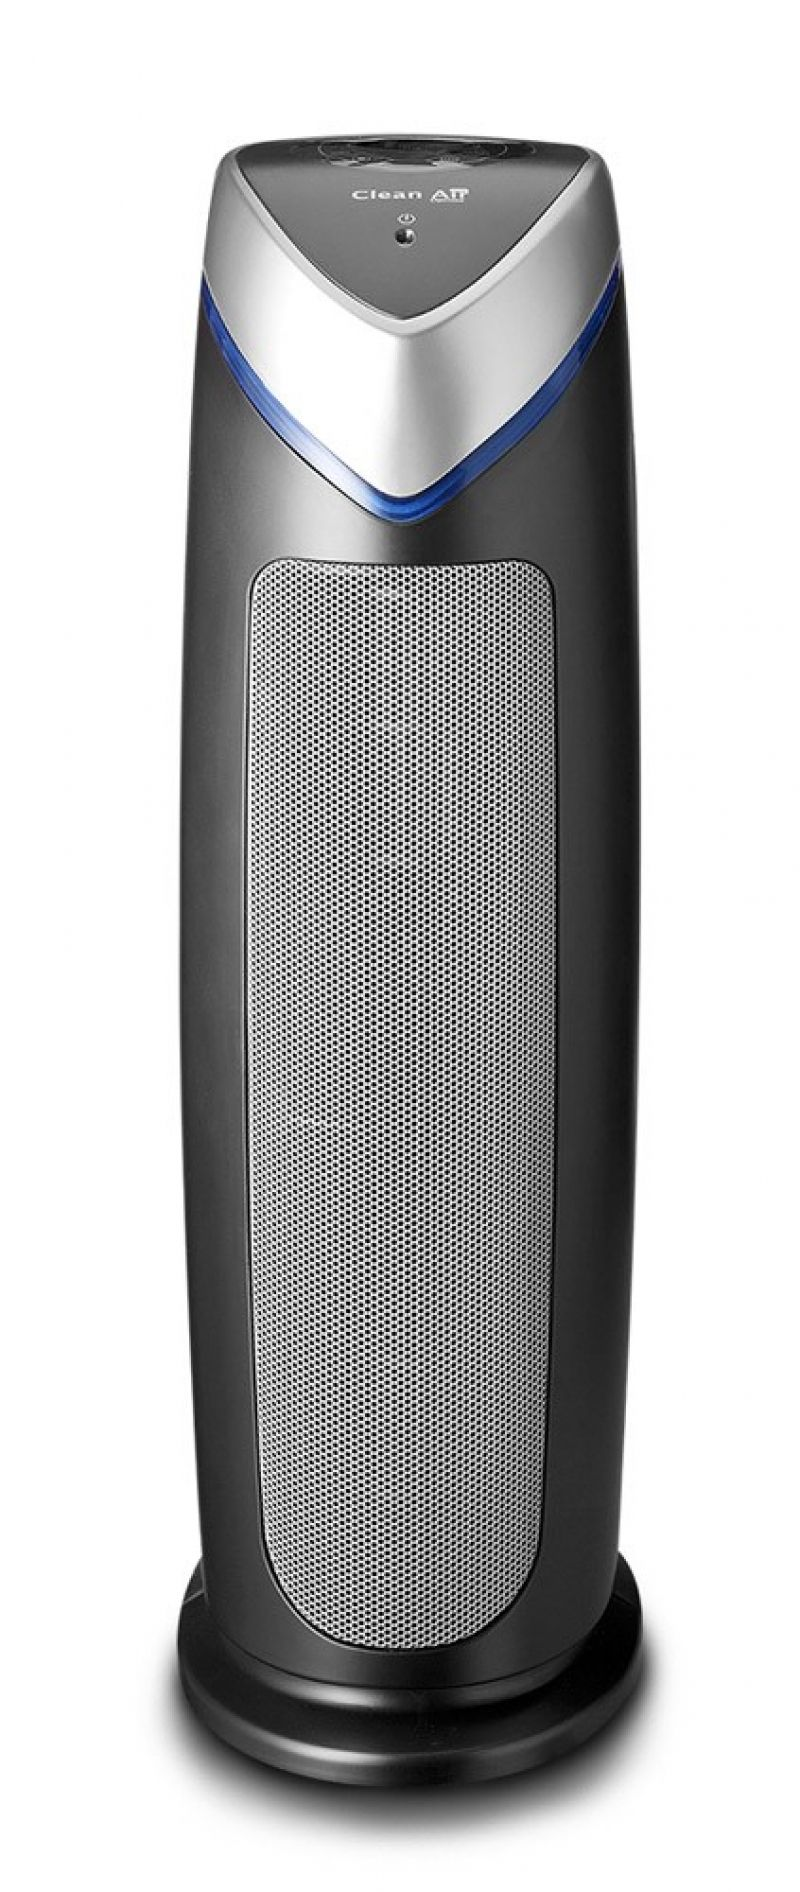 Purificator de aer Clean Air Optima CA506, Filtru Hepa si Carbon Activ, Lampa UV-C, Display, Timer, Debit 220 mc/ora, Consum 48W